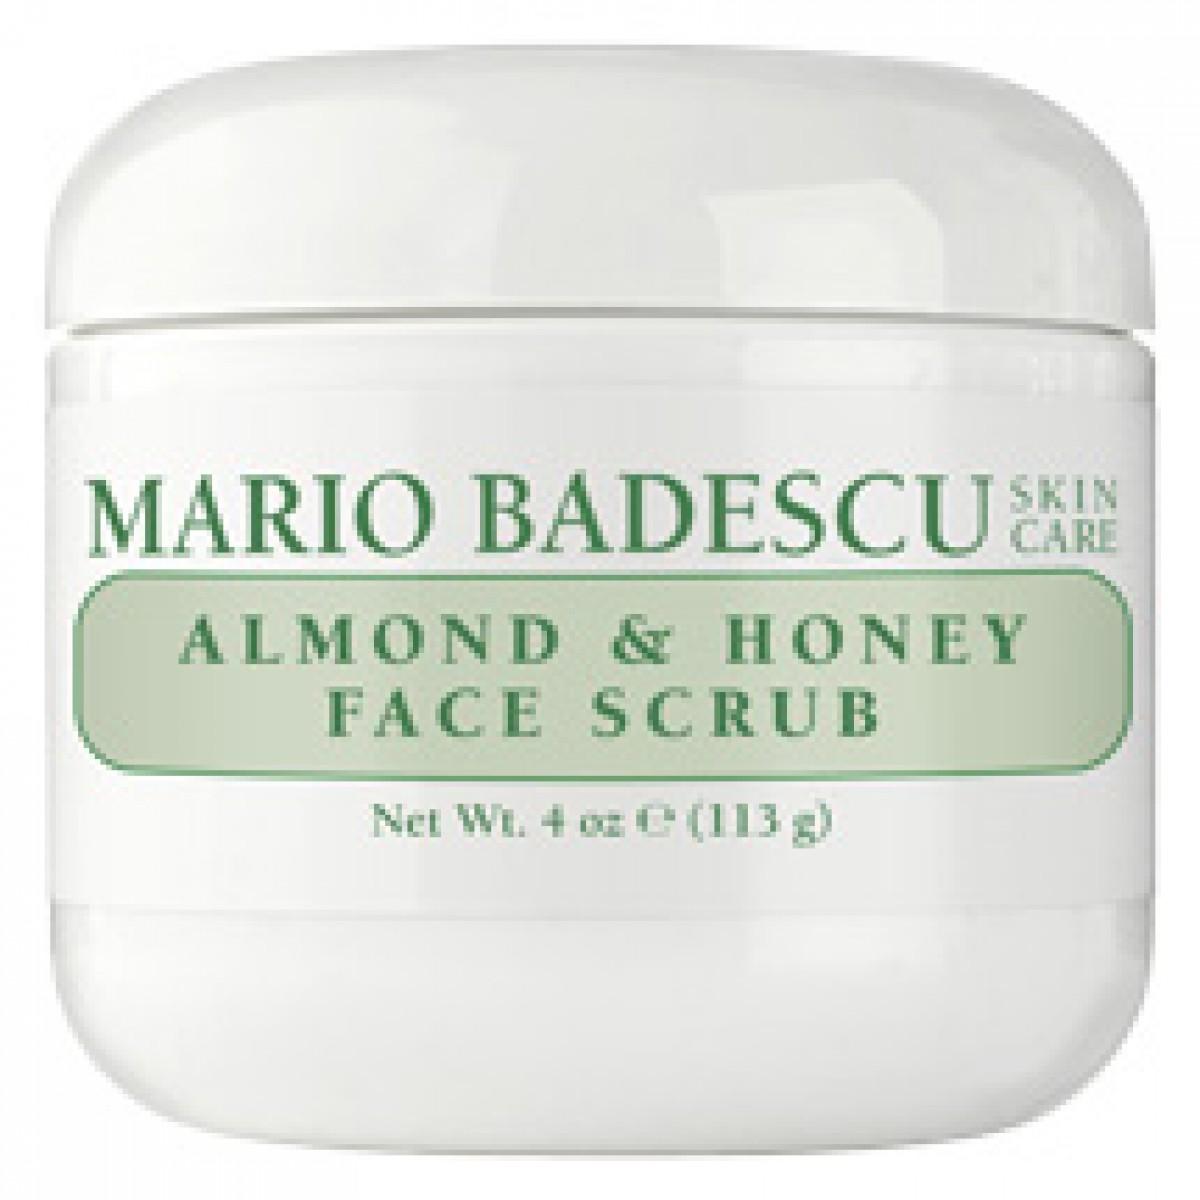 Almond amp honey face scrub